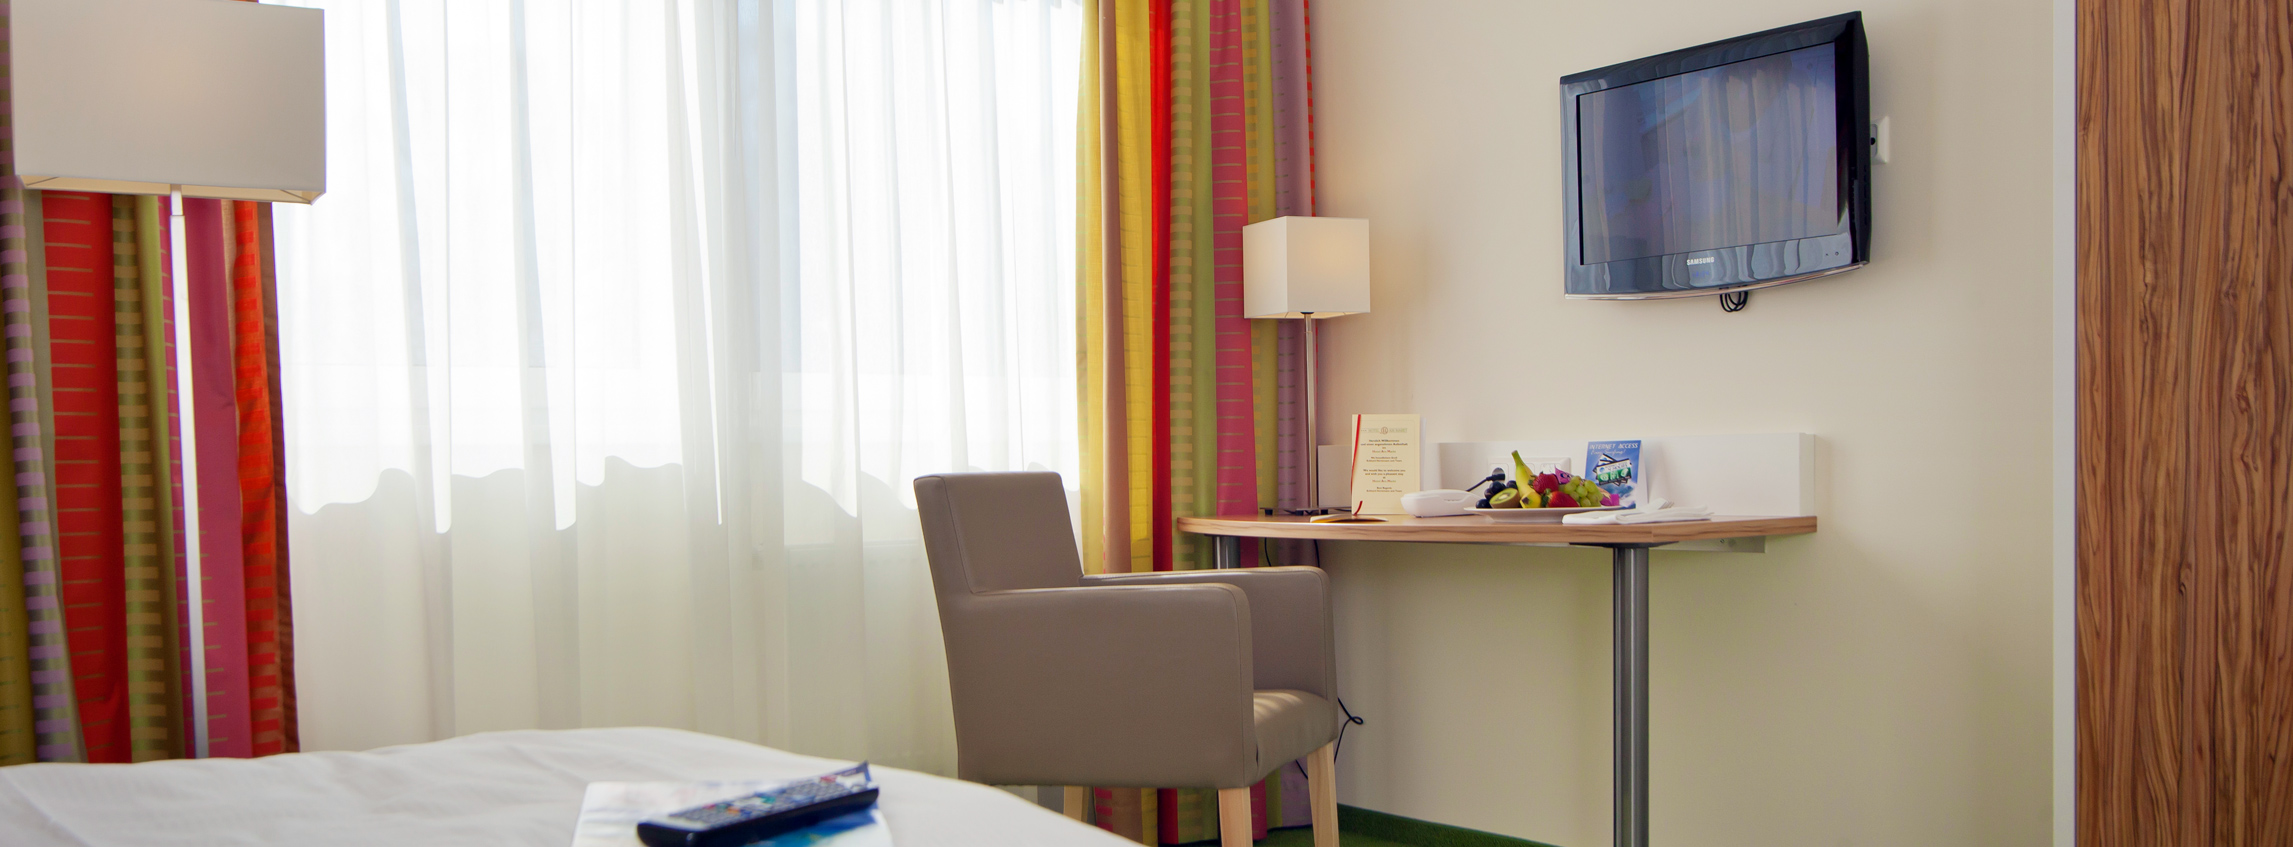 https://www.hotel-bad-honnef.de/wp-content/uploads/2016/08/Slider_Zimmer3.jpg